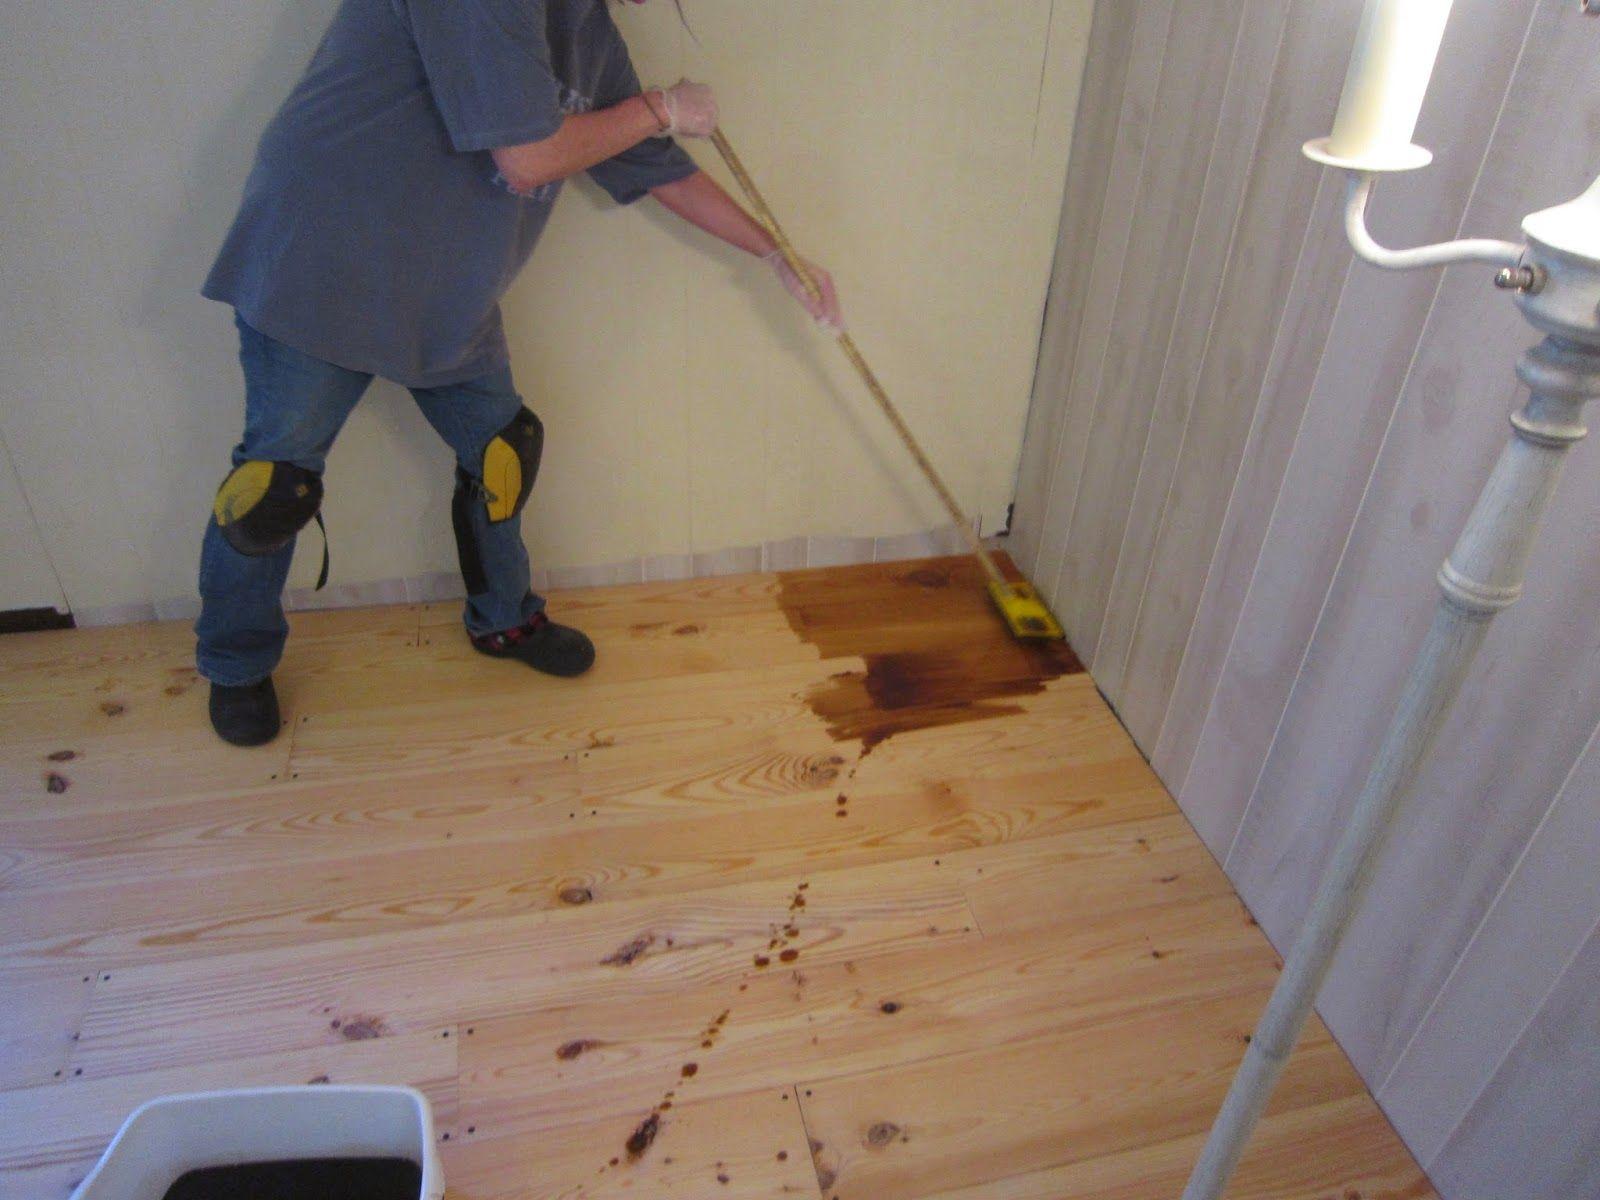 pennies primitives heart pine tongue and groove floor diy home improvement projects wood floor. Black Bedroom Furniture Sets. Home Design Ideas